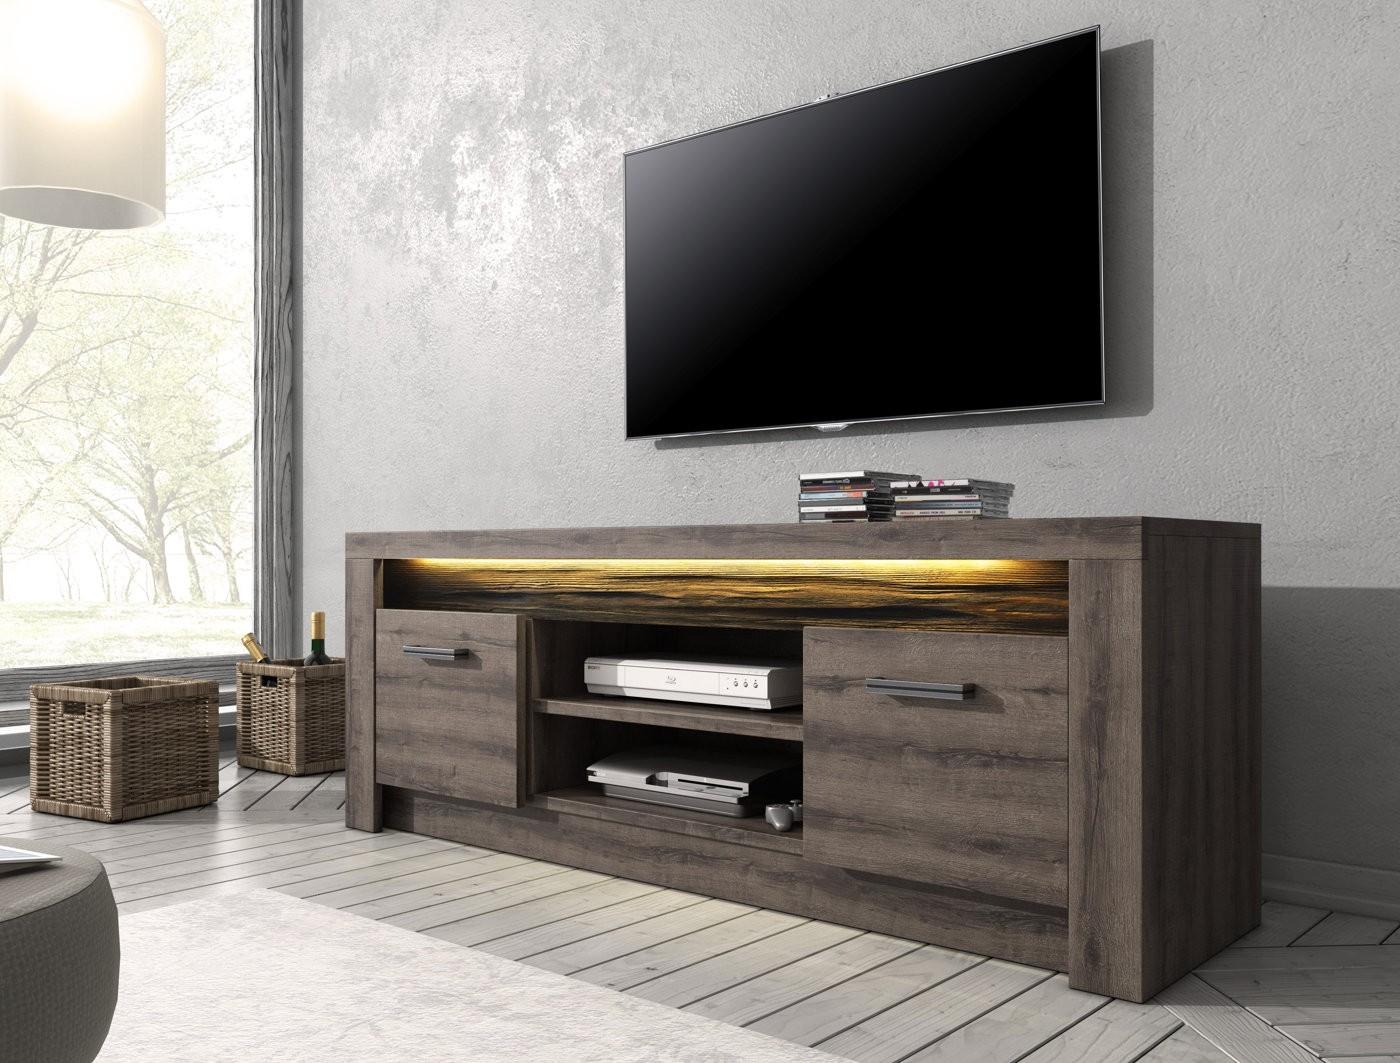 Led Verlichting Kast : Tv meubel invido donker eiken cm met led verlichting